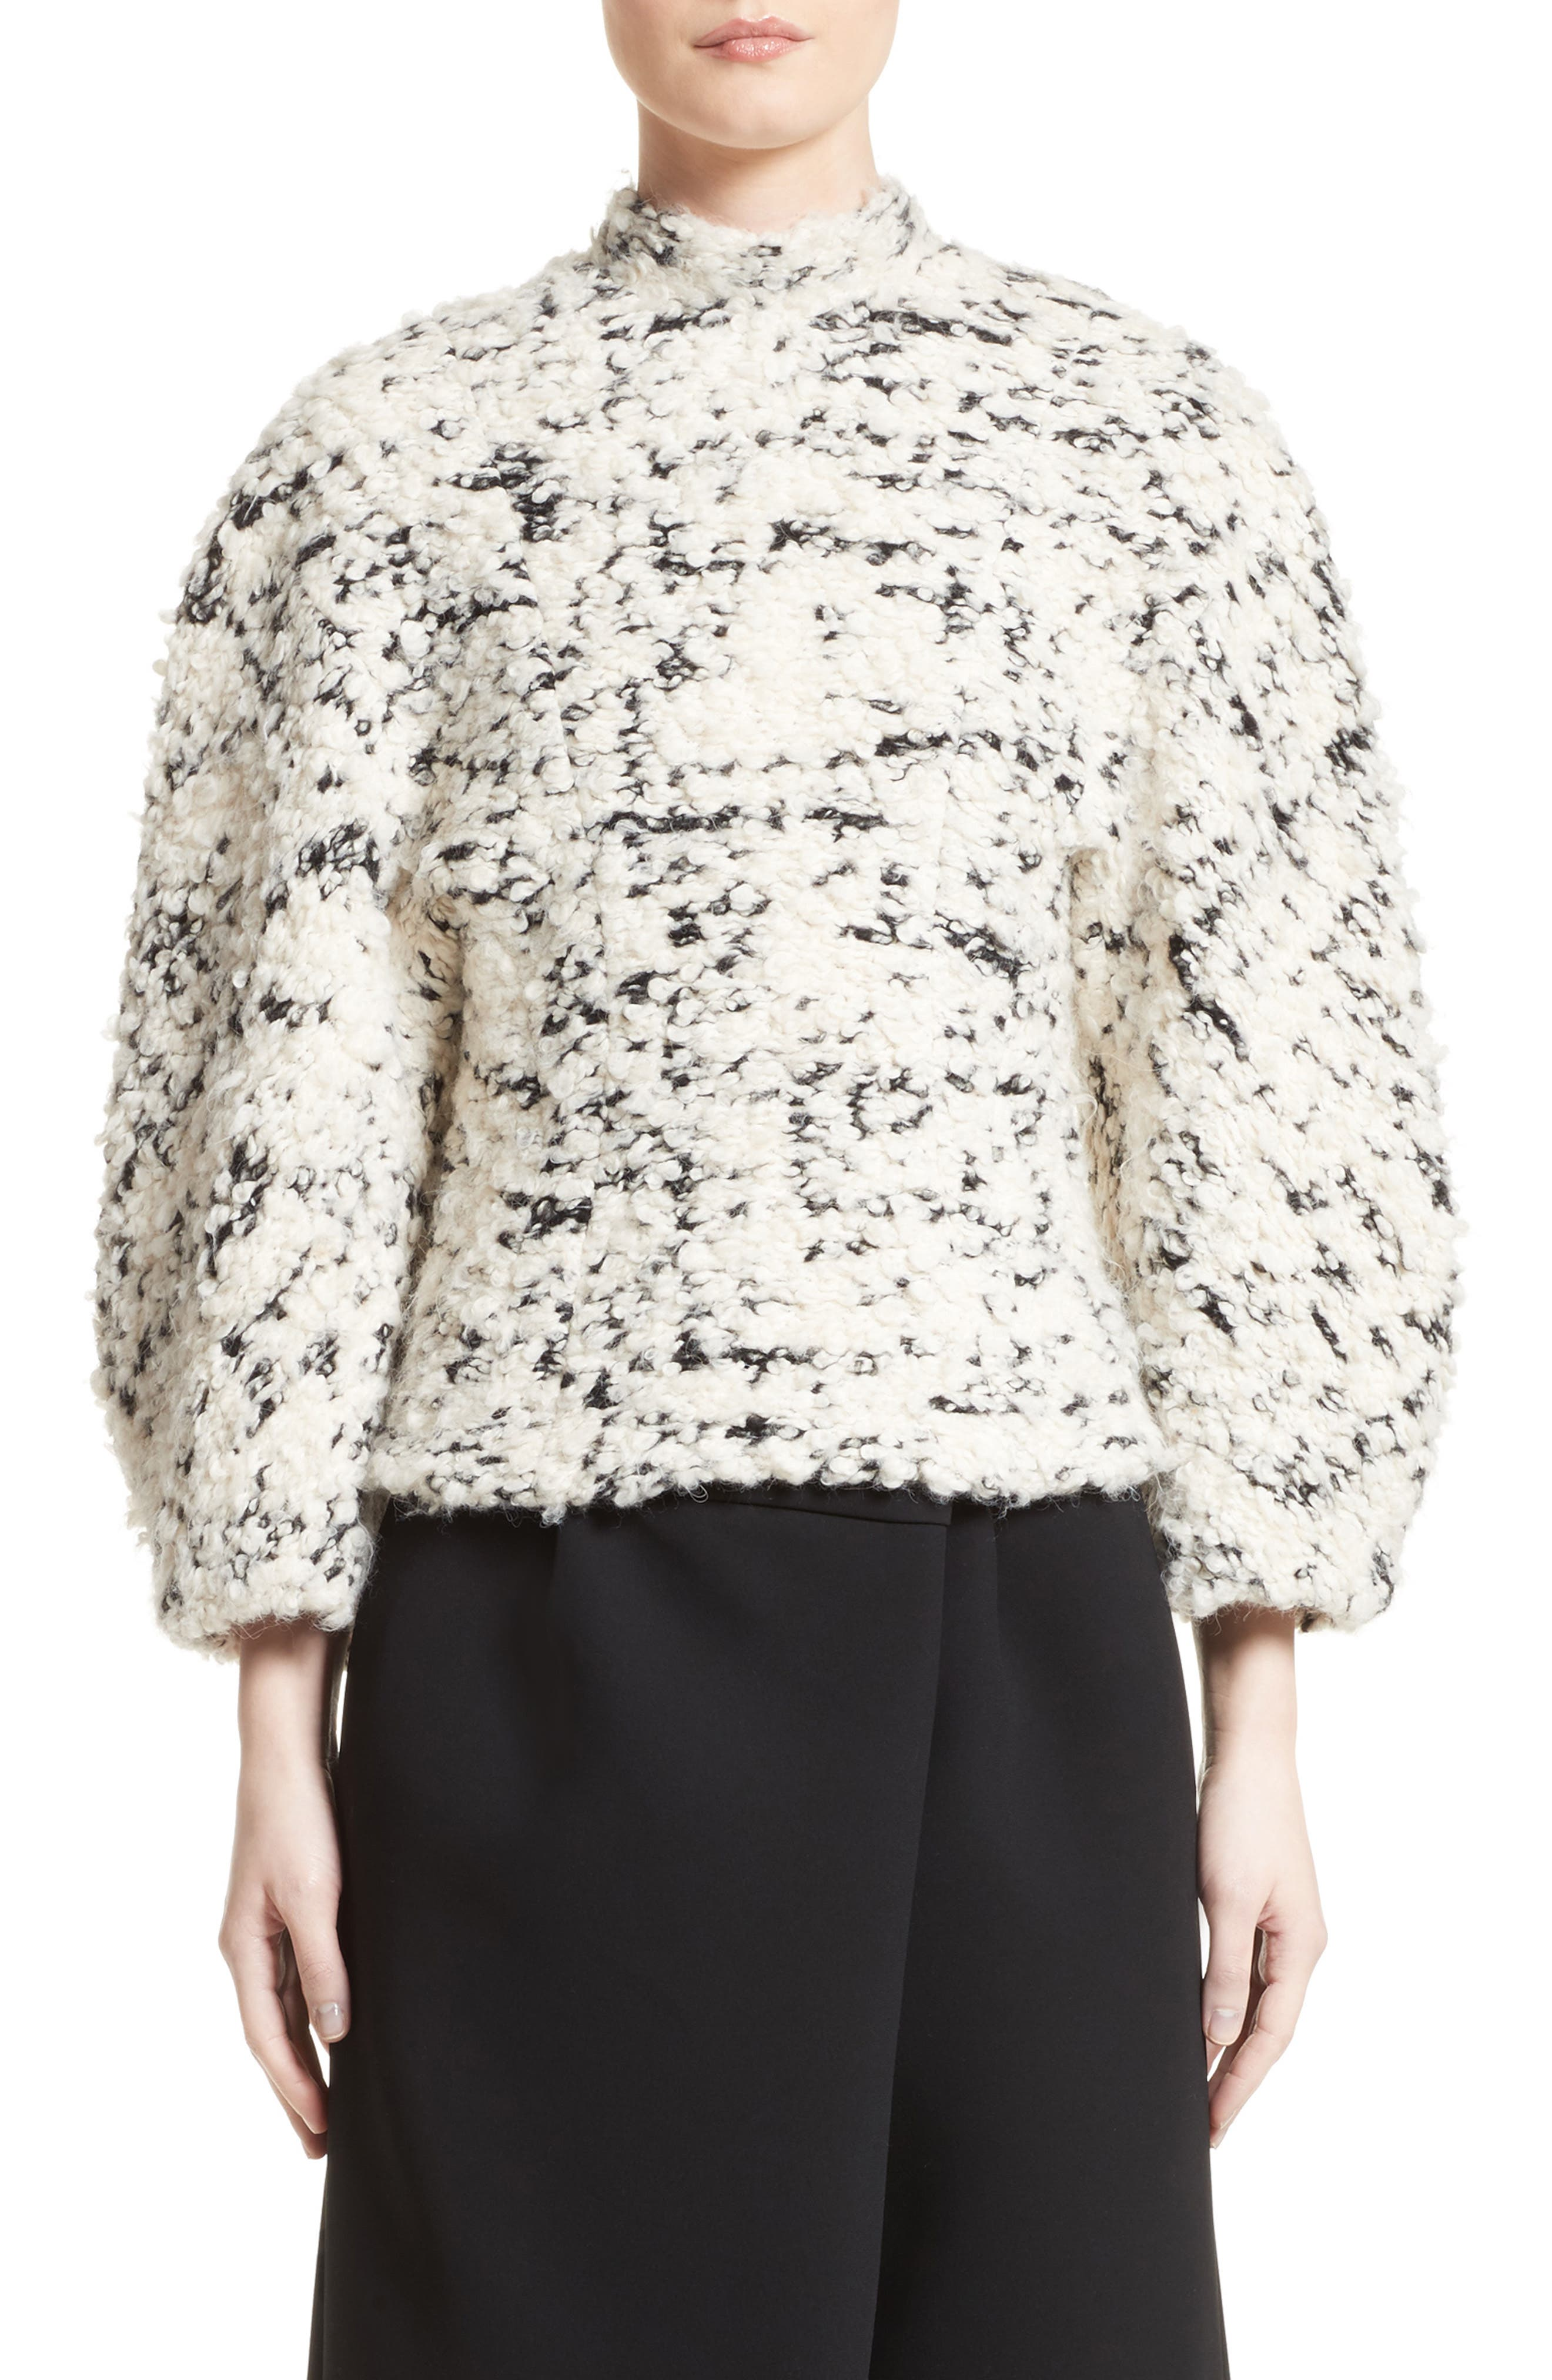 A.W.A.K.E. Textured Mock Neck Sweater